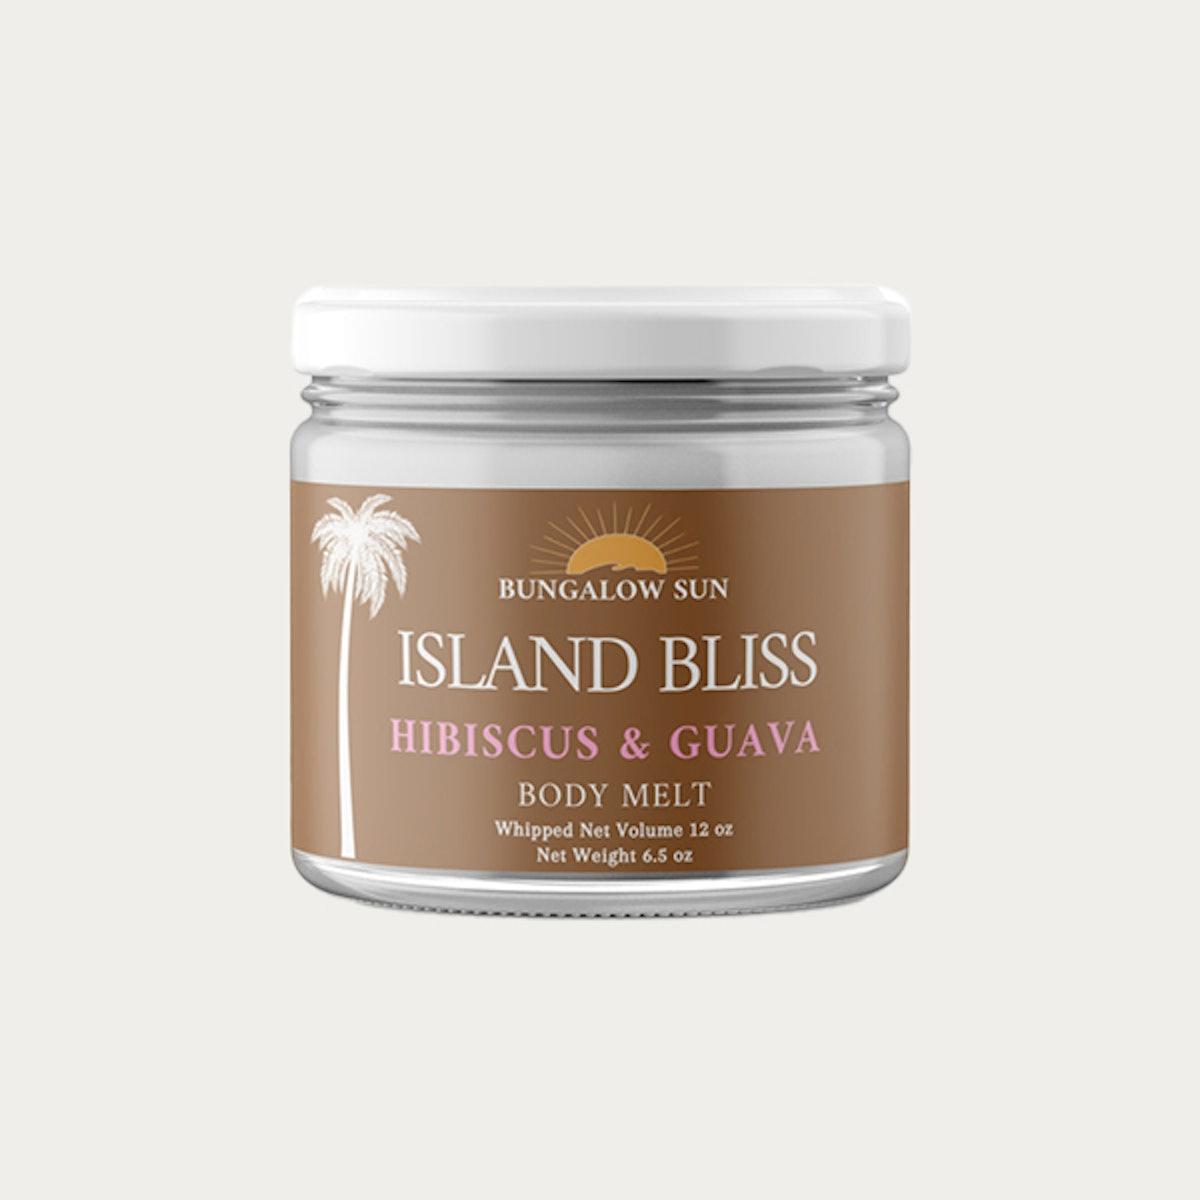 Island Bliss Body Melt